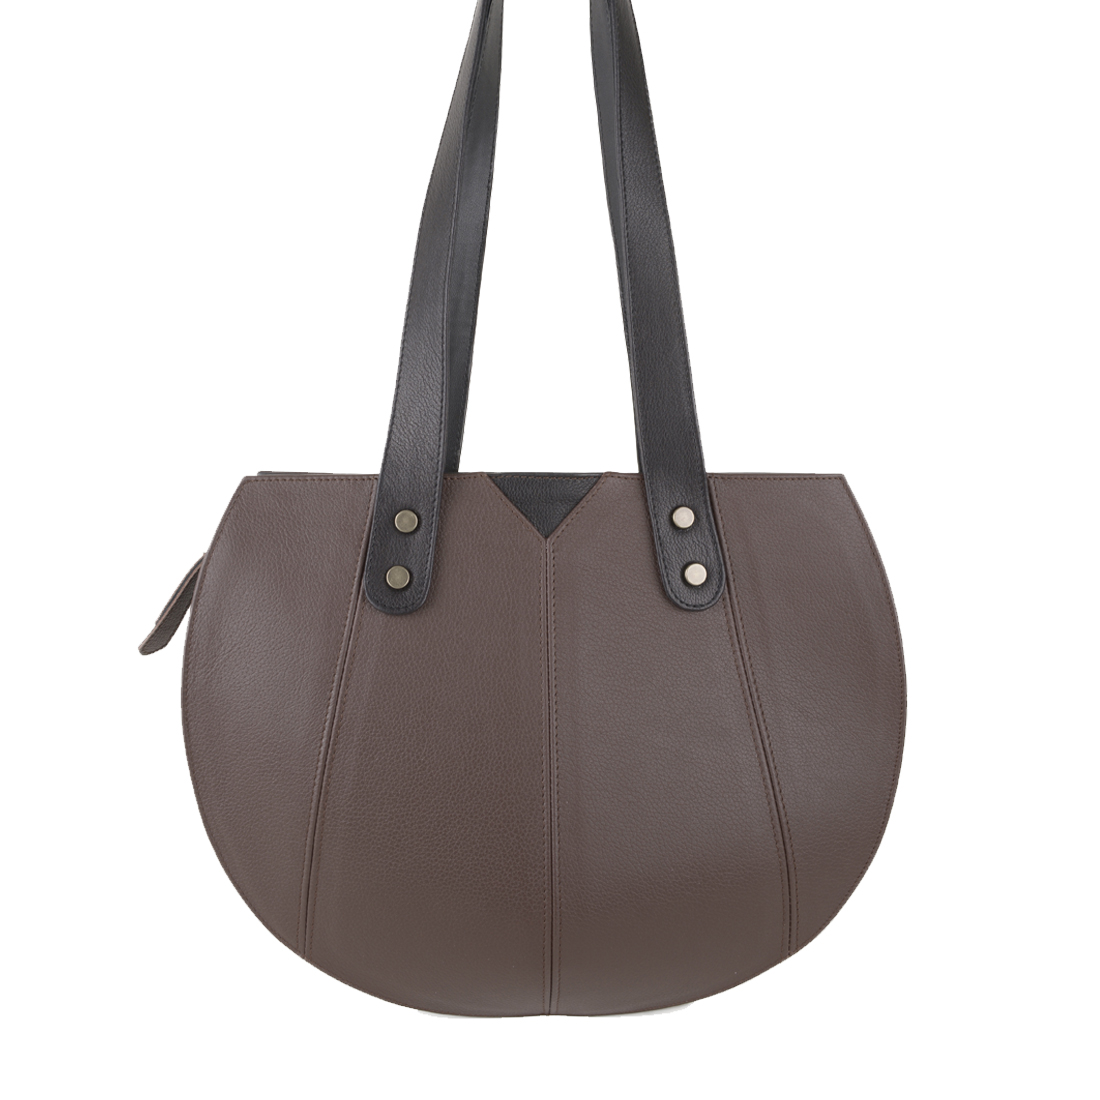 Carrie Brown Leather Shoulder Bag